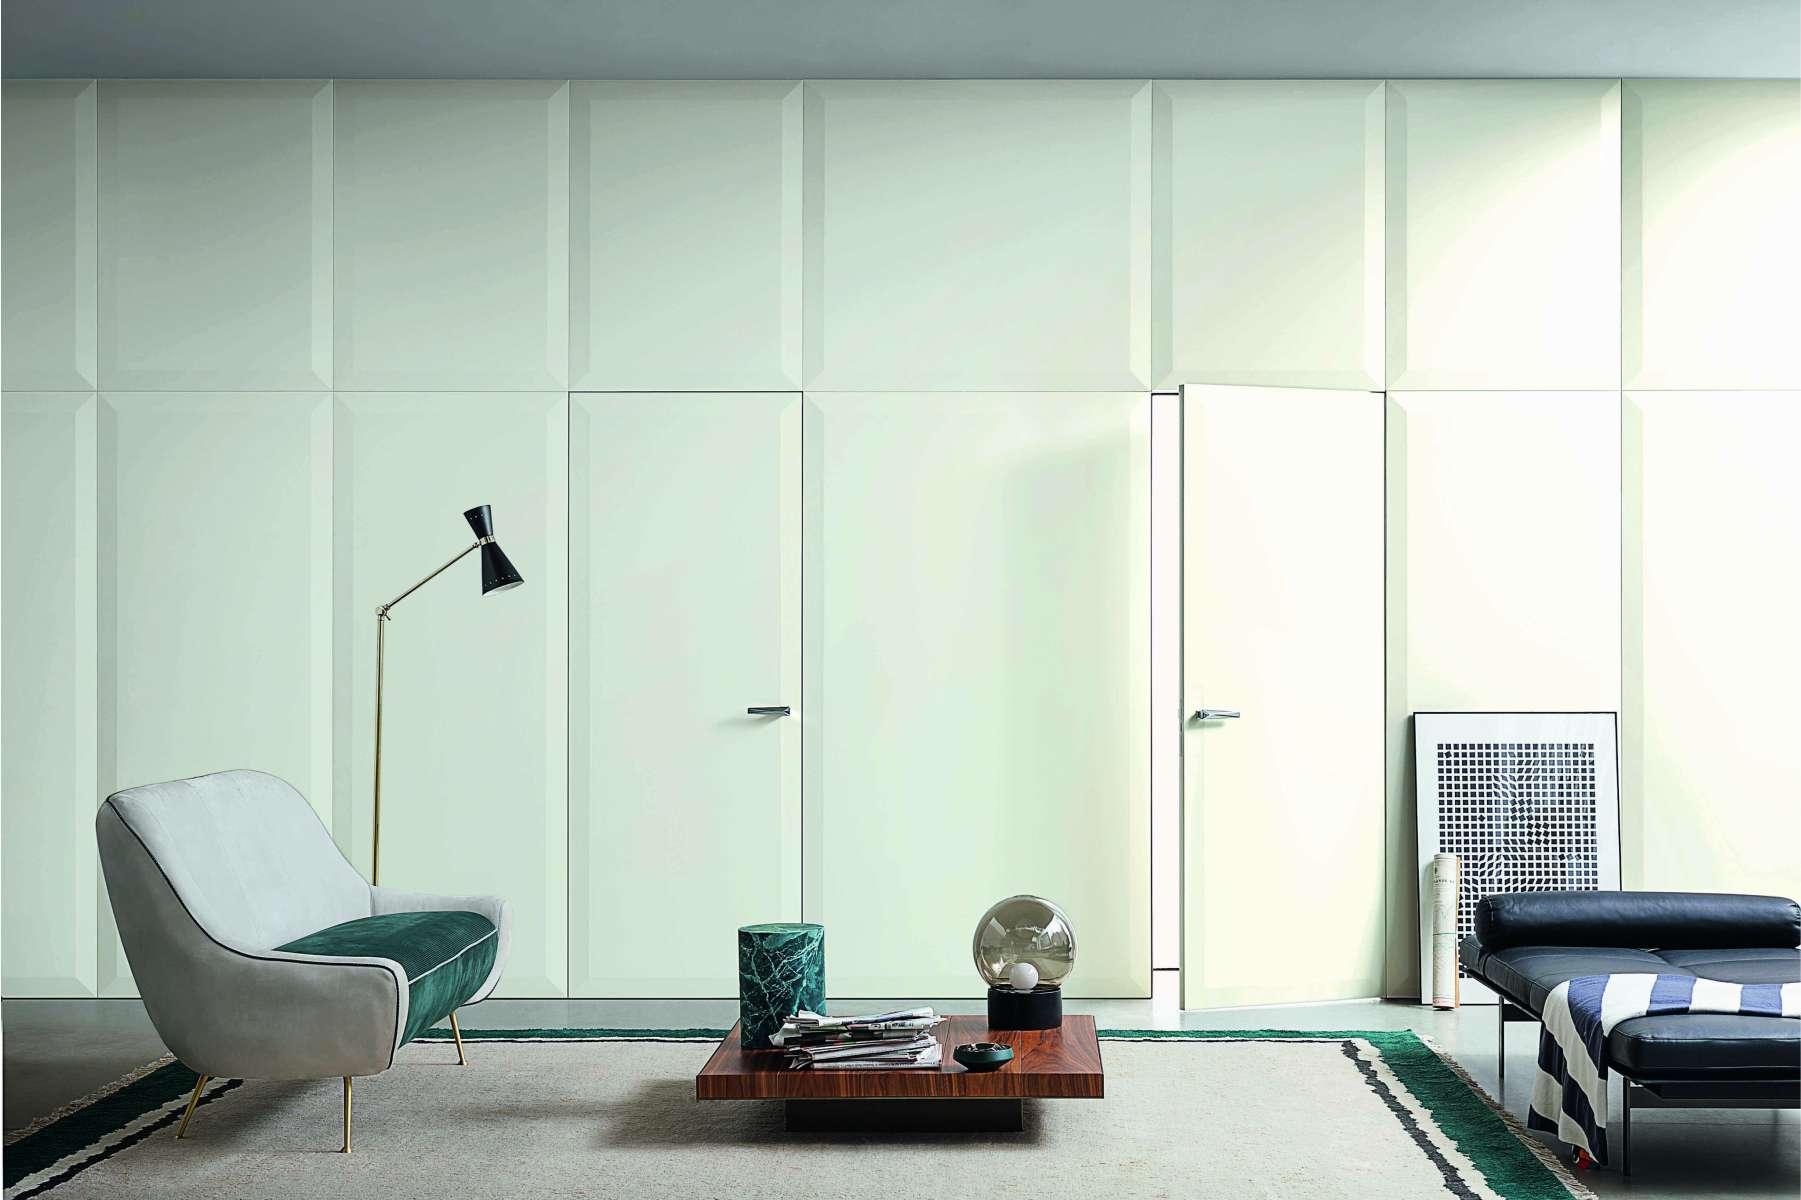 Studio Marco Piva – Product design – 331